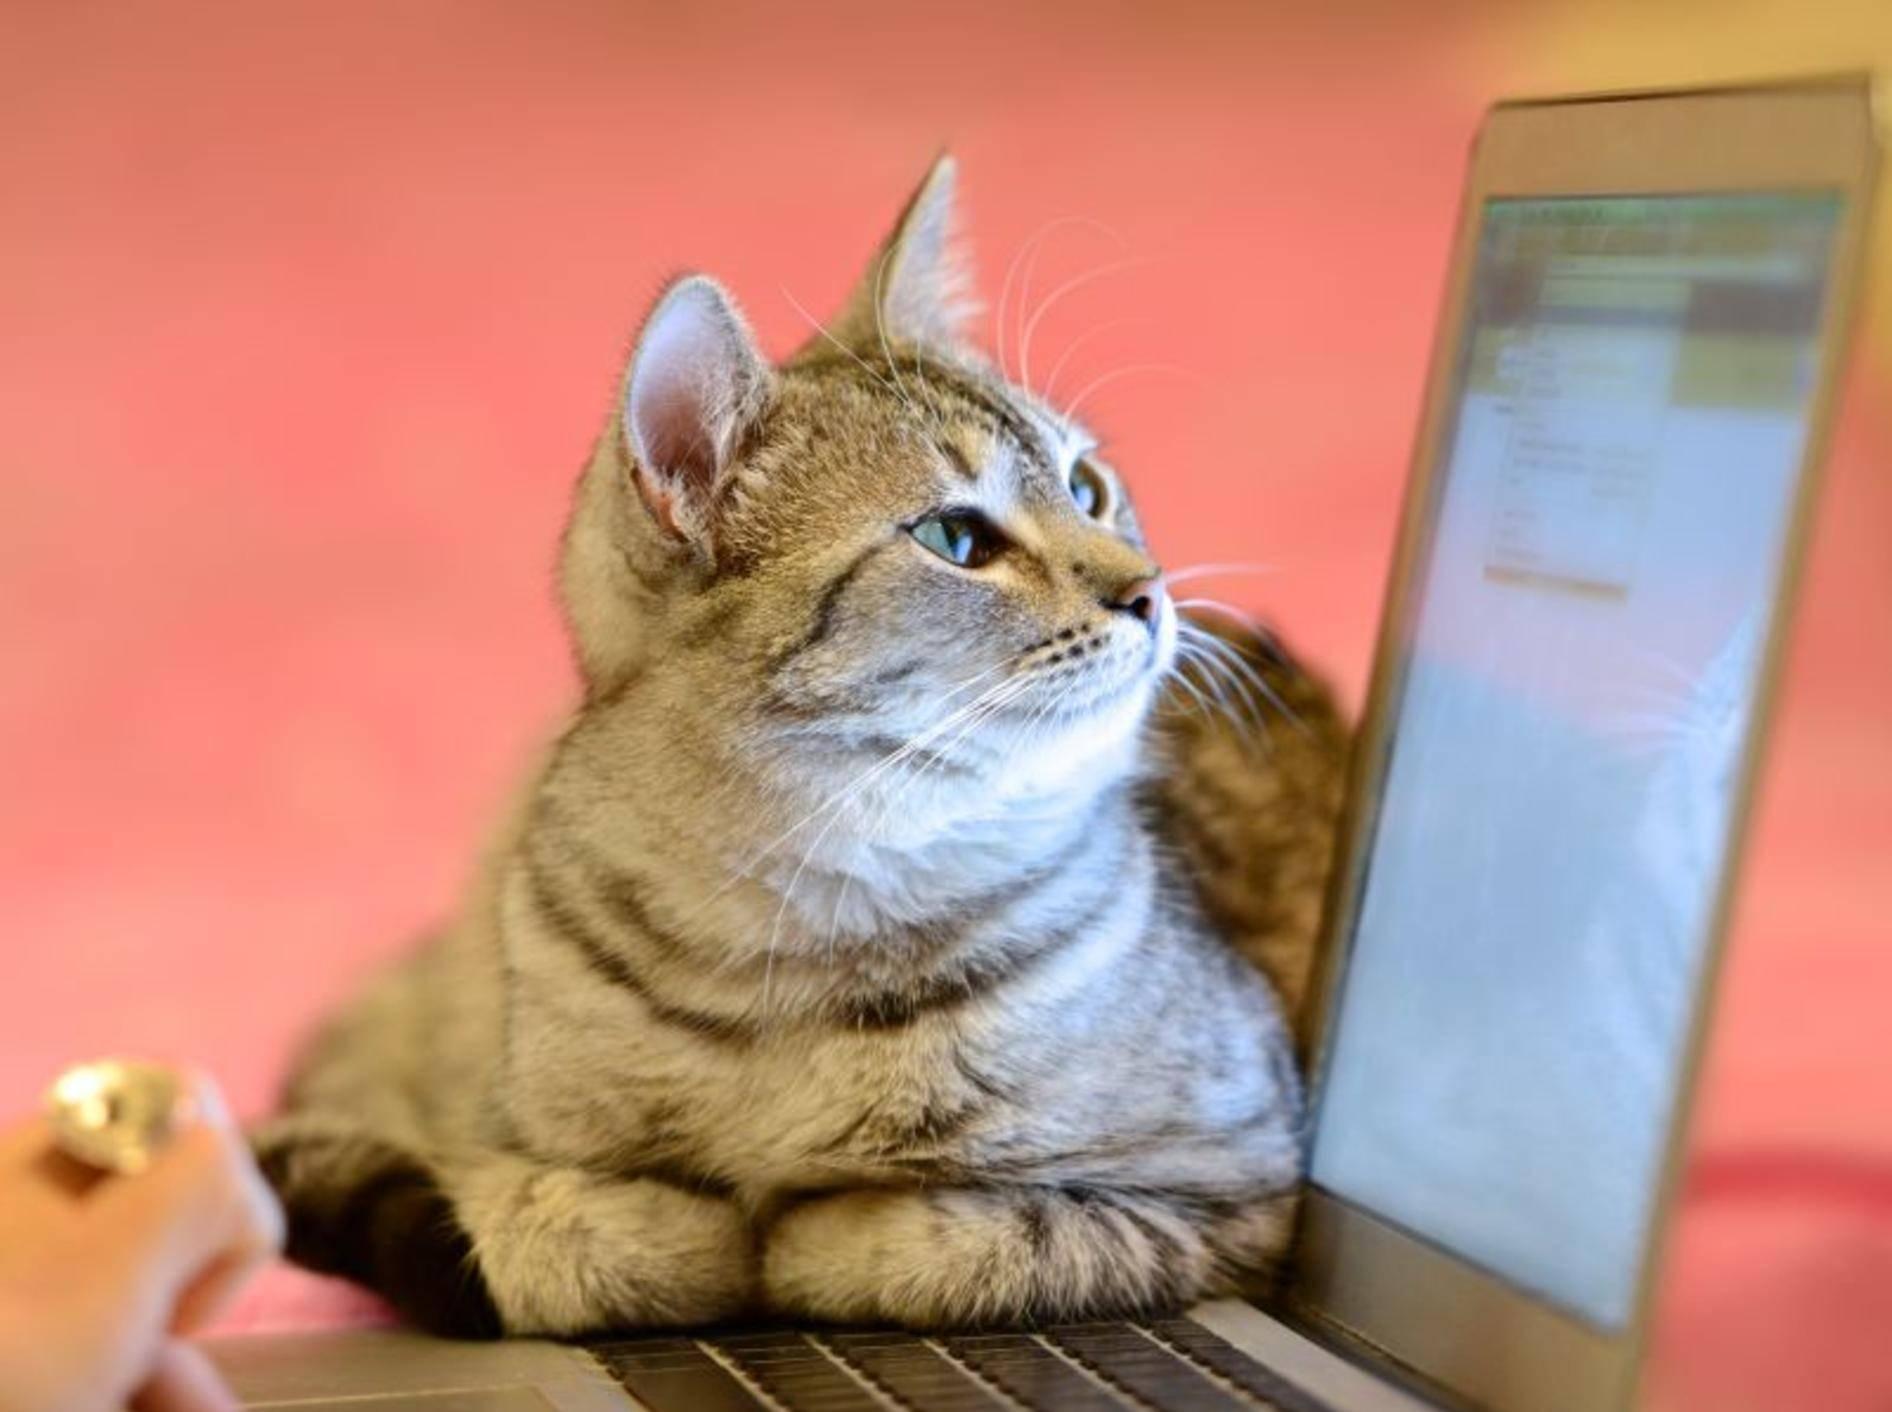 Simon's Cat Artikel für Katzen – Bild: Shutterstock / Renata Apanaviciene